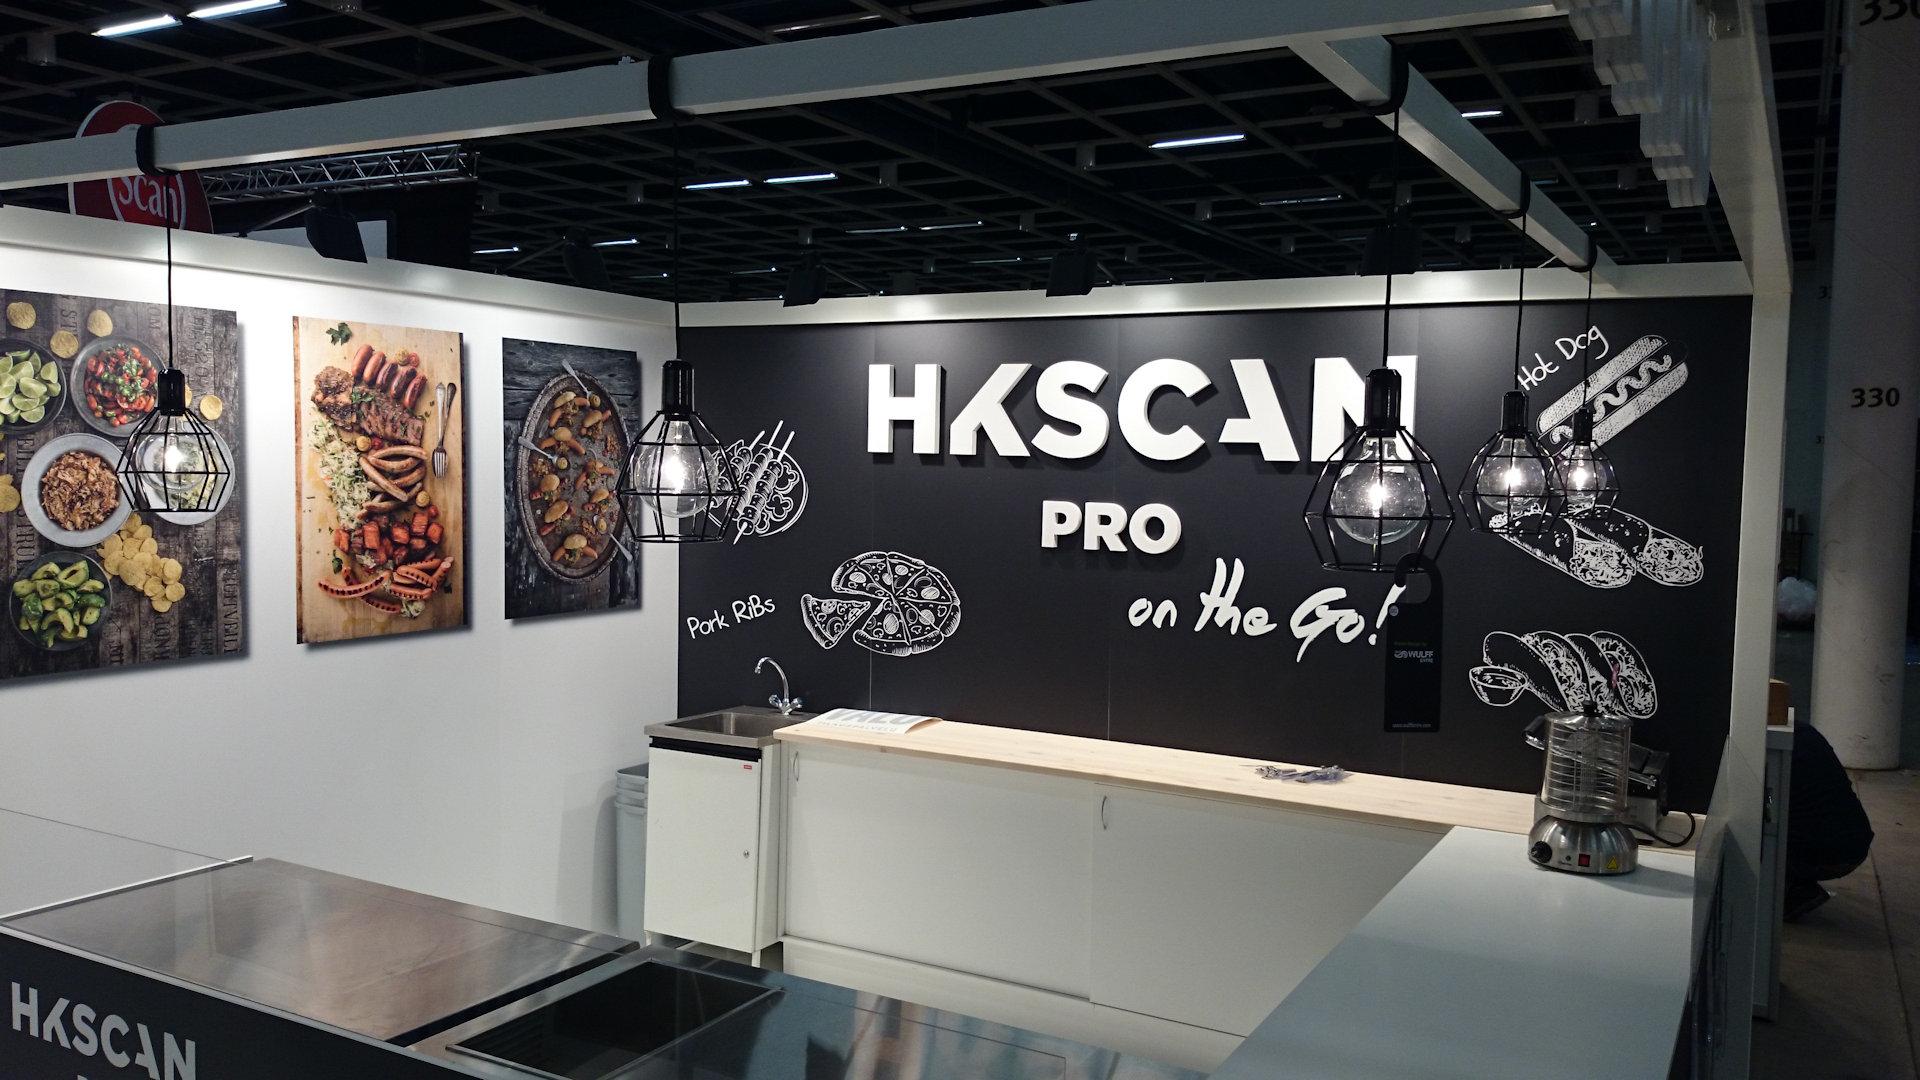 HK_Scan_Helsingi_2016_3